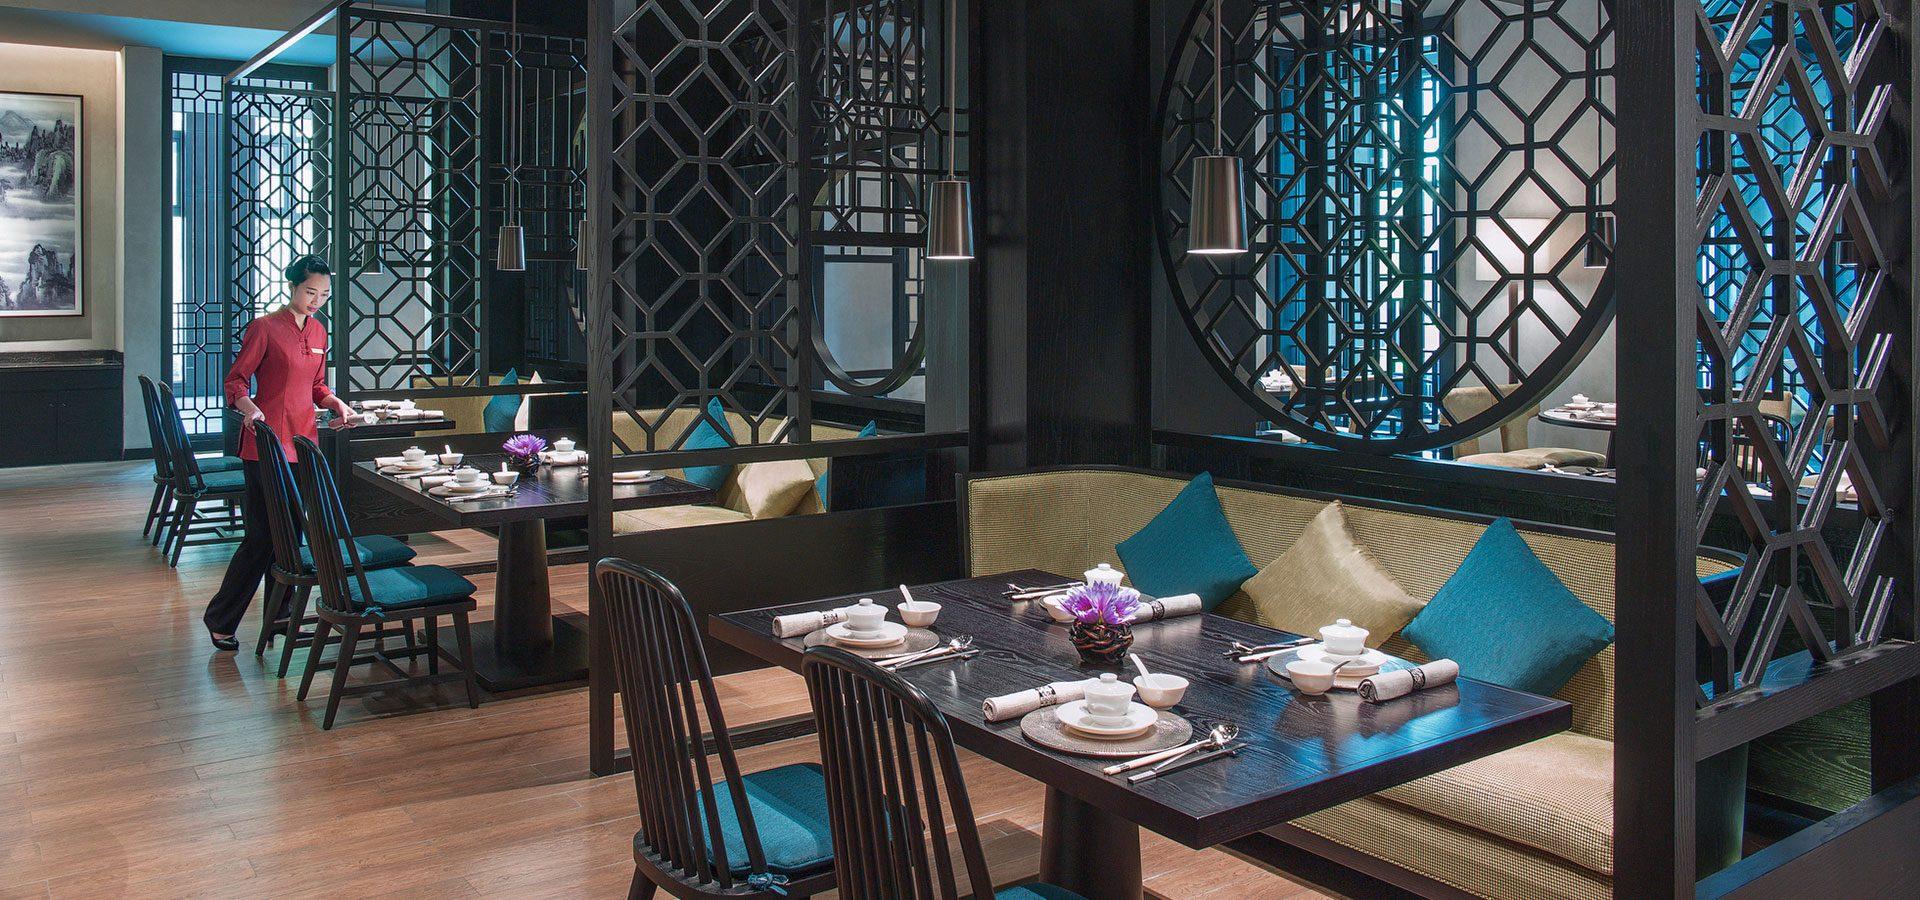 dusitdevarana-conghua-dining-cui-hu-xuan-chinese-restaurant